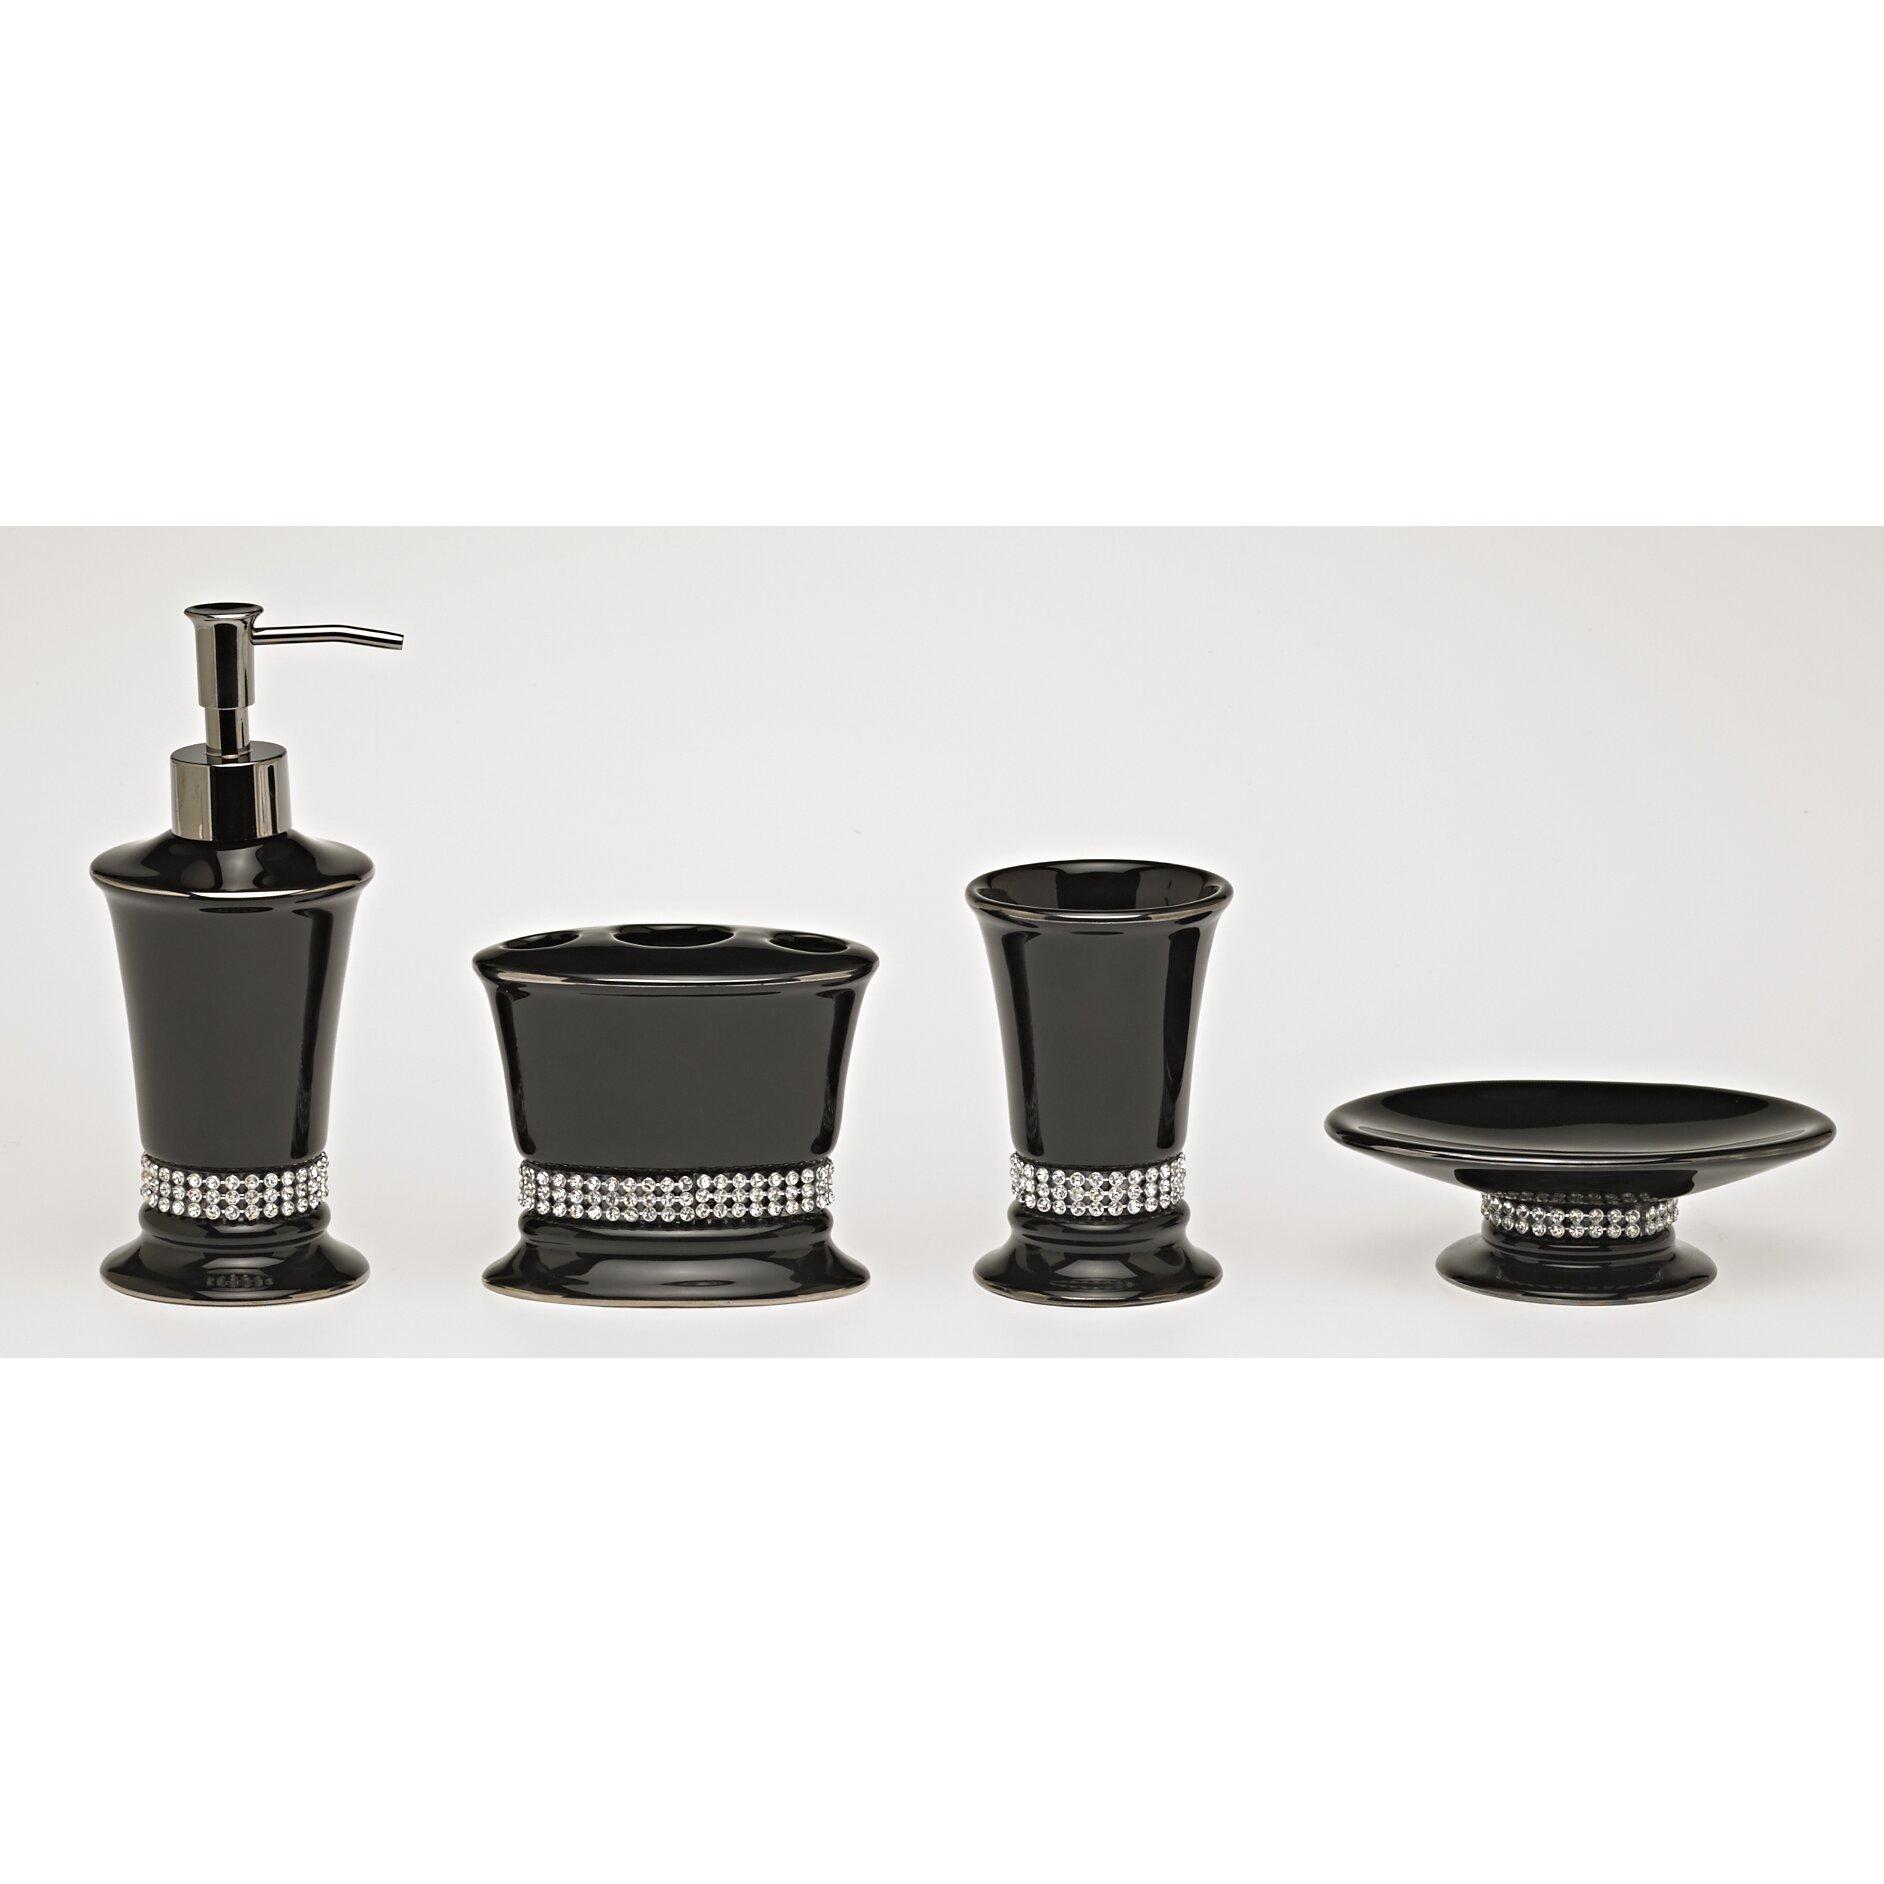 4 Piece Kitchen Appliance Set Moda At Home Broadway Ceramic 4 Piece Bathroom Accessory Set